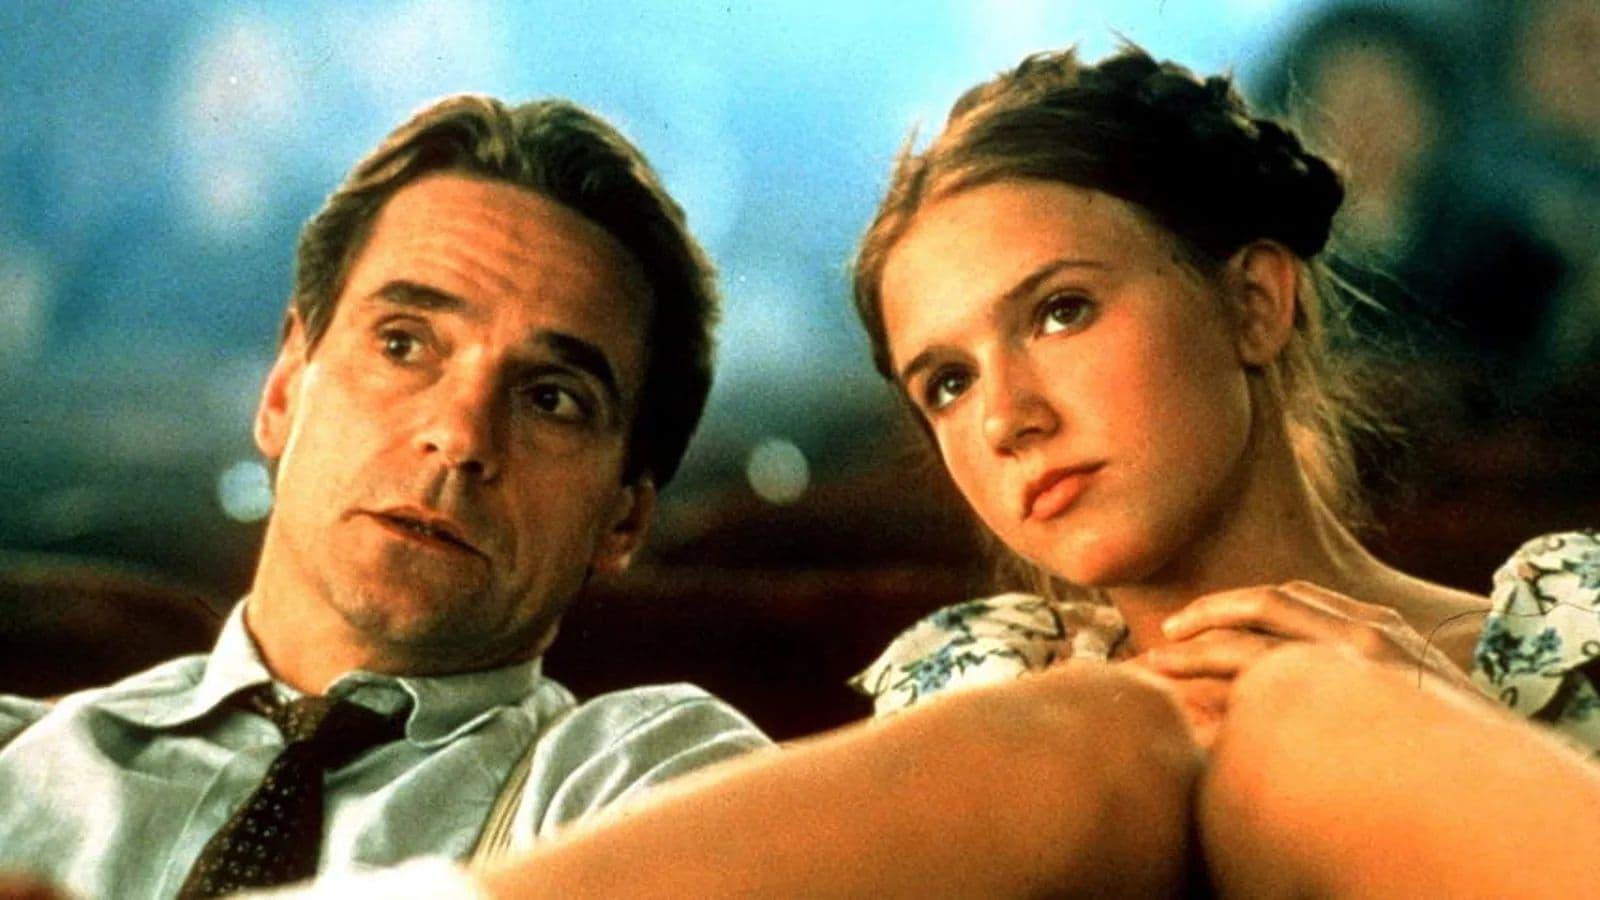 Lolita (1997)  Movies Online - easymovies.vip ▶1:56:35